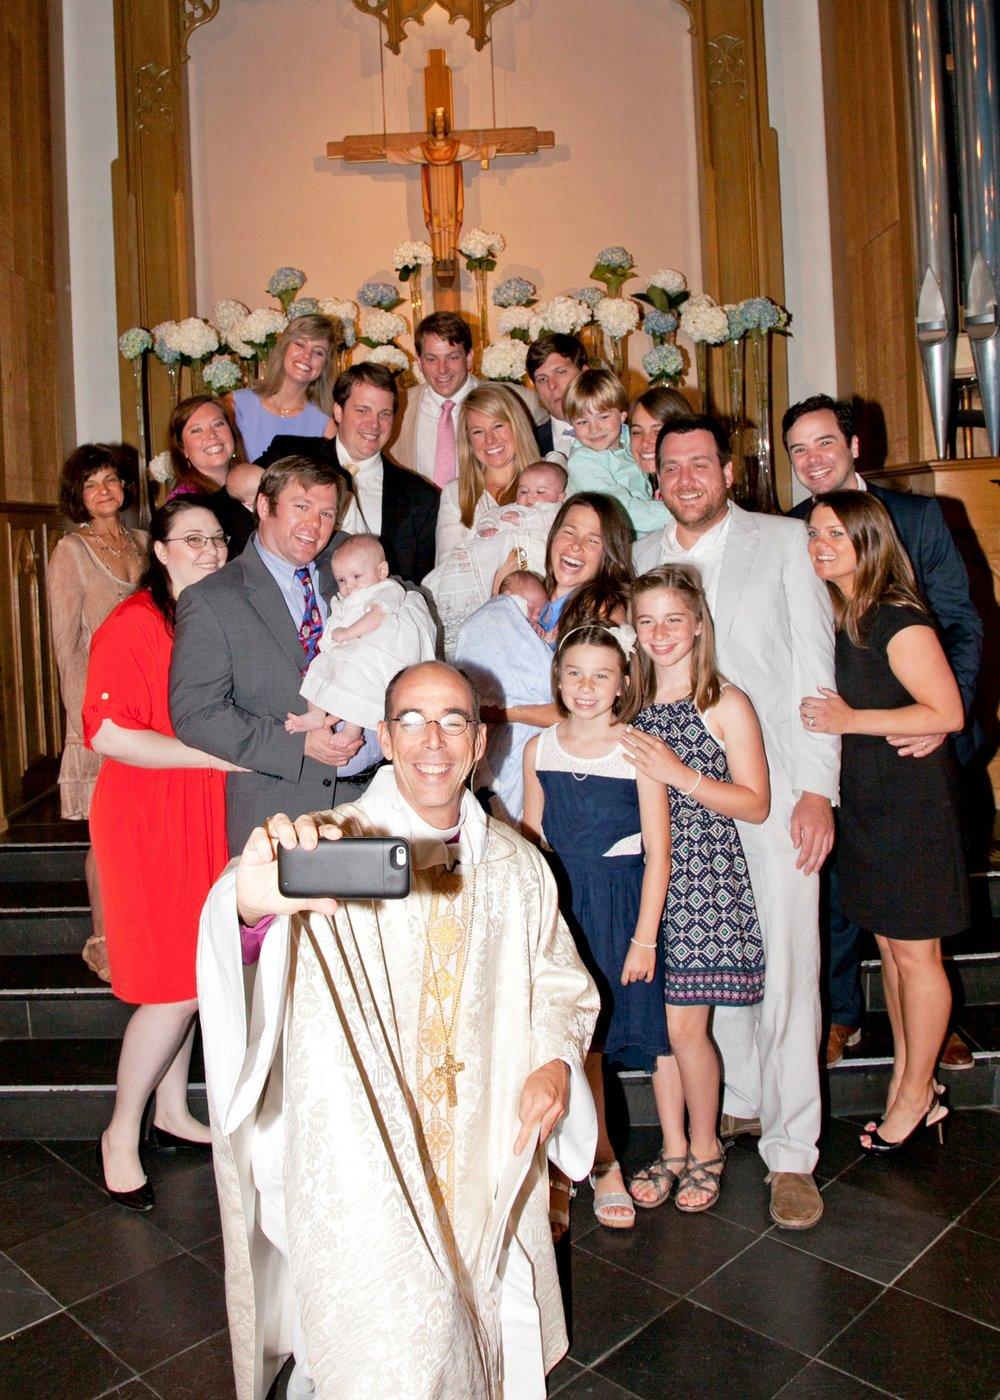 baptisms-with-bishop-seage.jpg